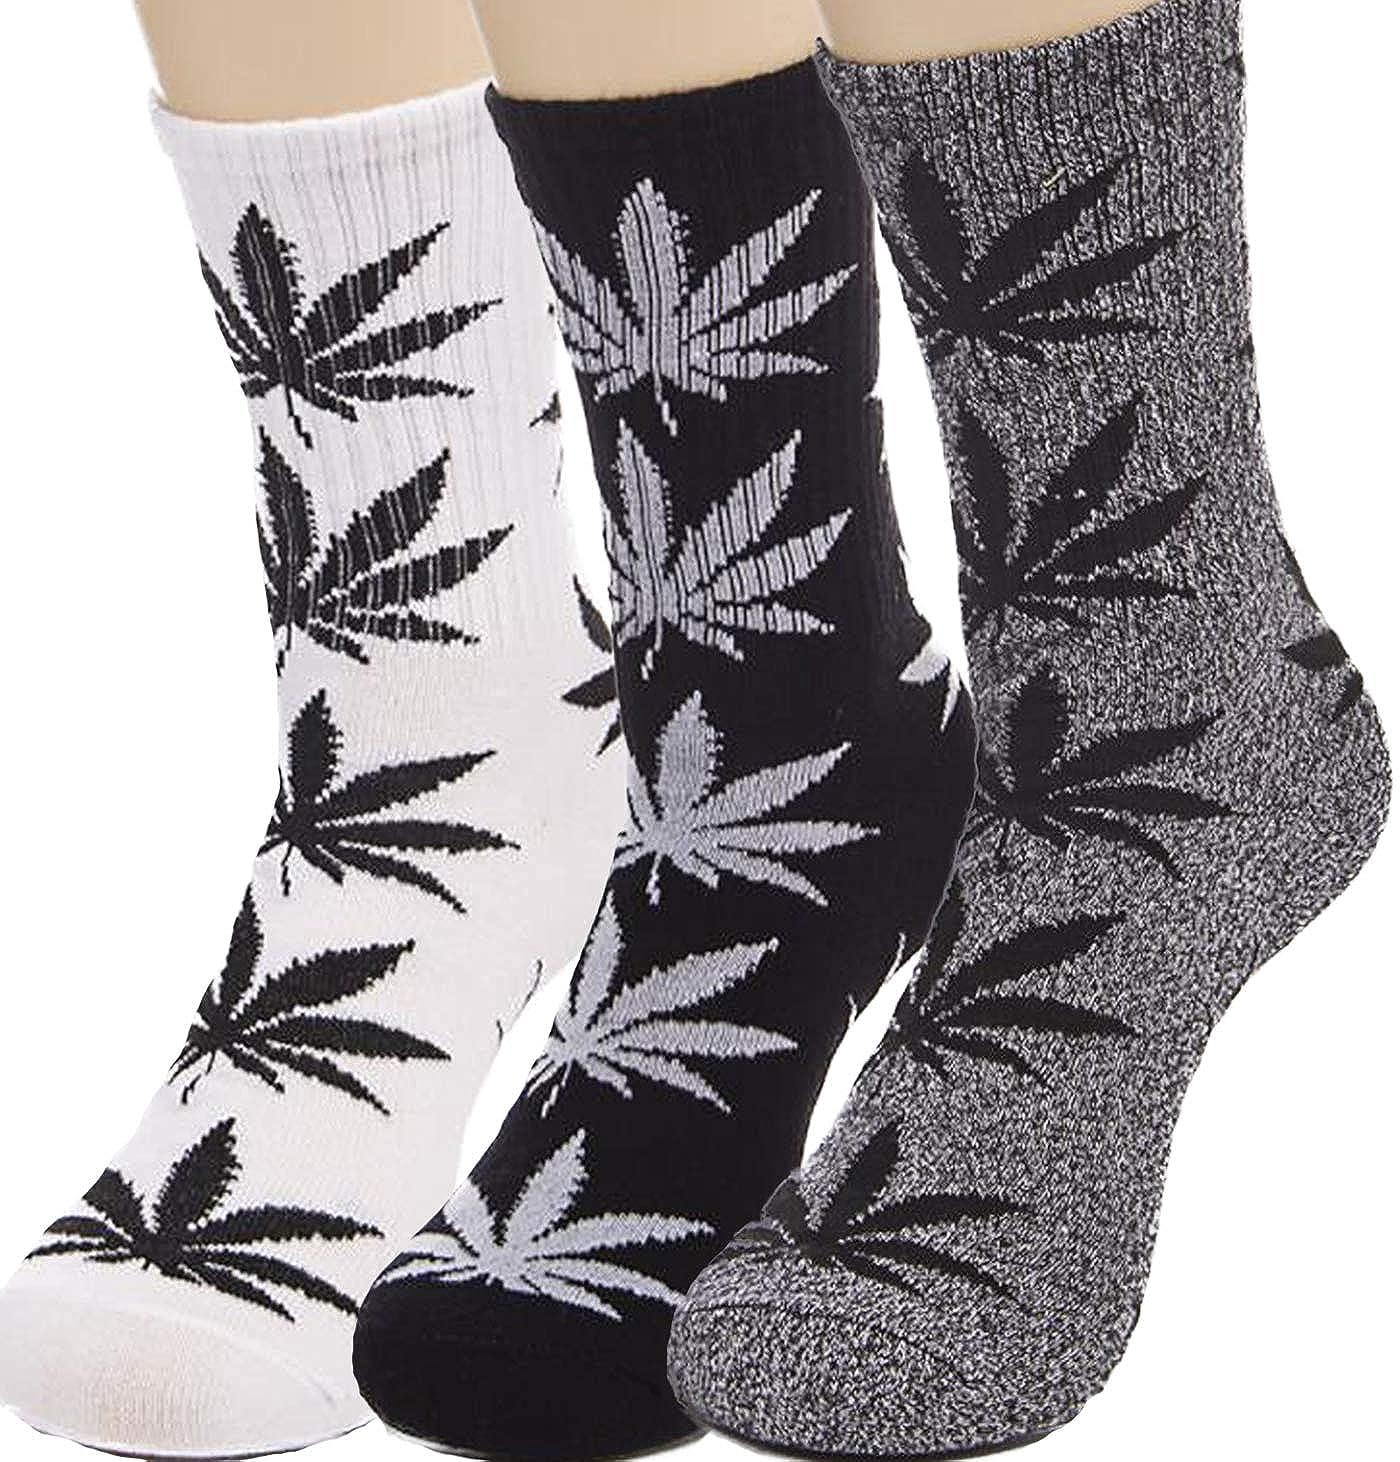 3 Pairs Marijuana Weed Leaf Warm Cotton High Sport Socks Mix Colors